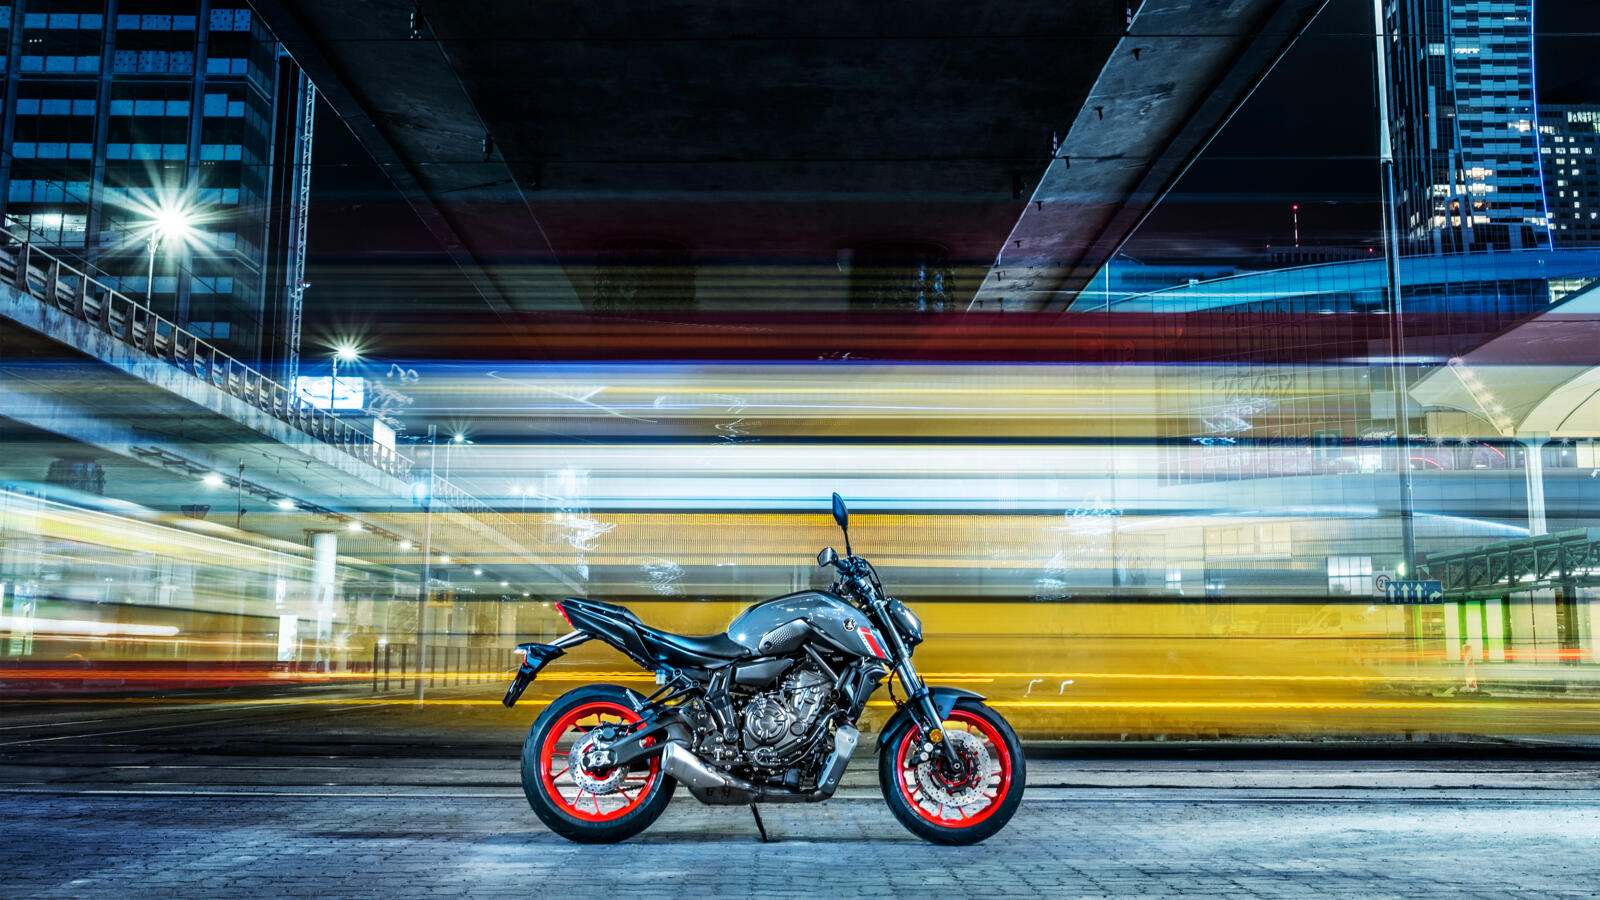 Yamaha-MT-07-my2021-26